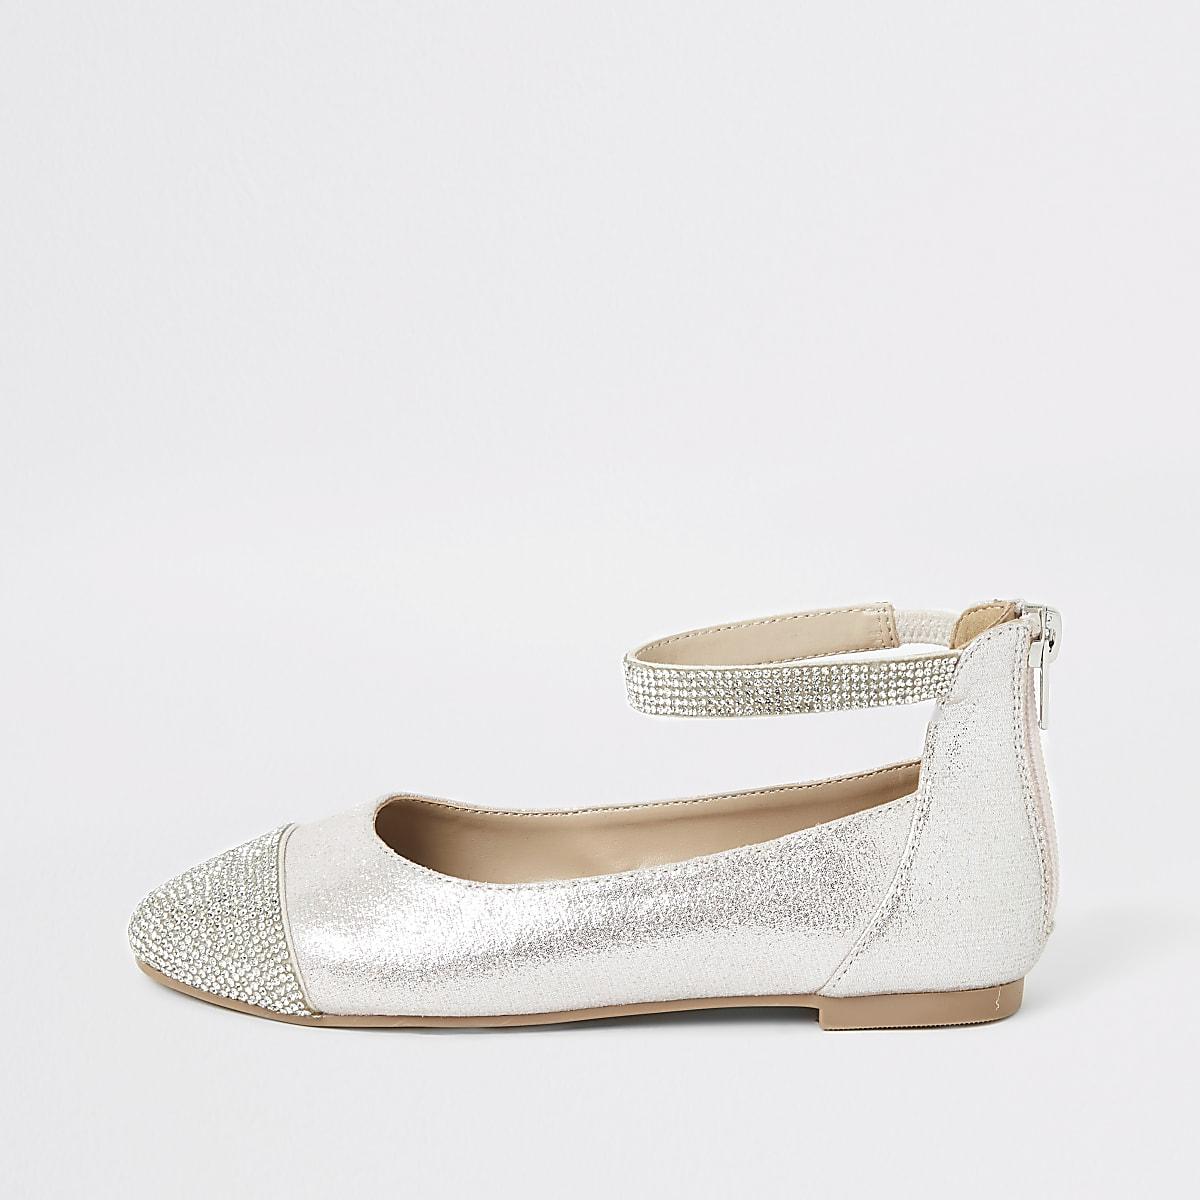 Girls pink diamante toe ballerina pumps